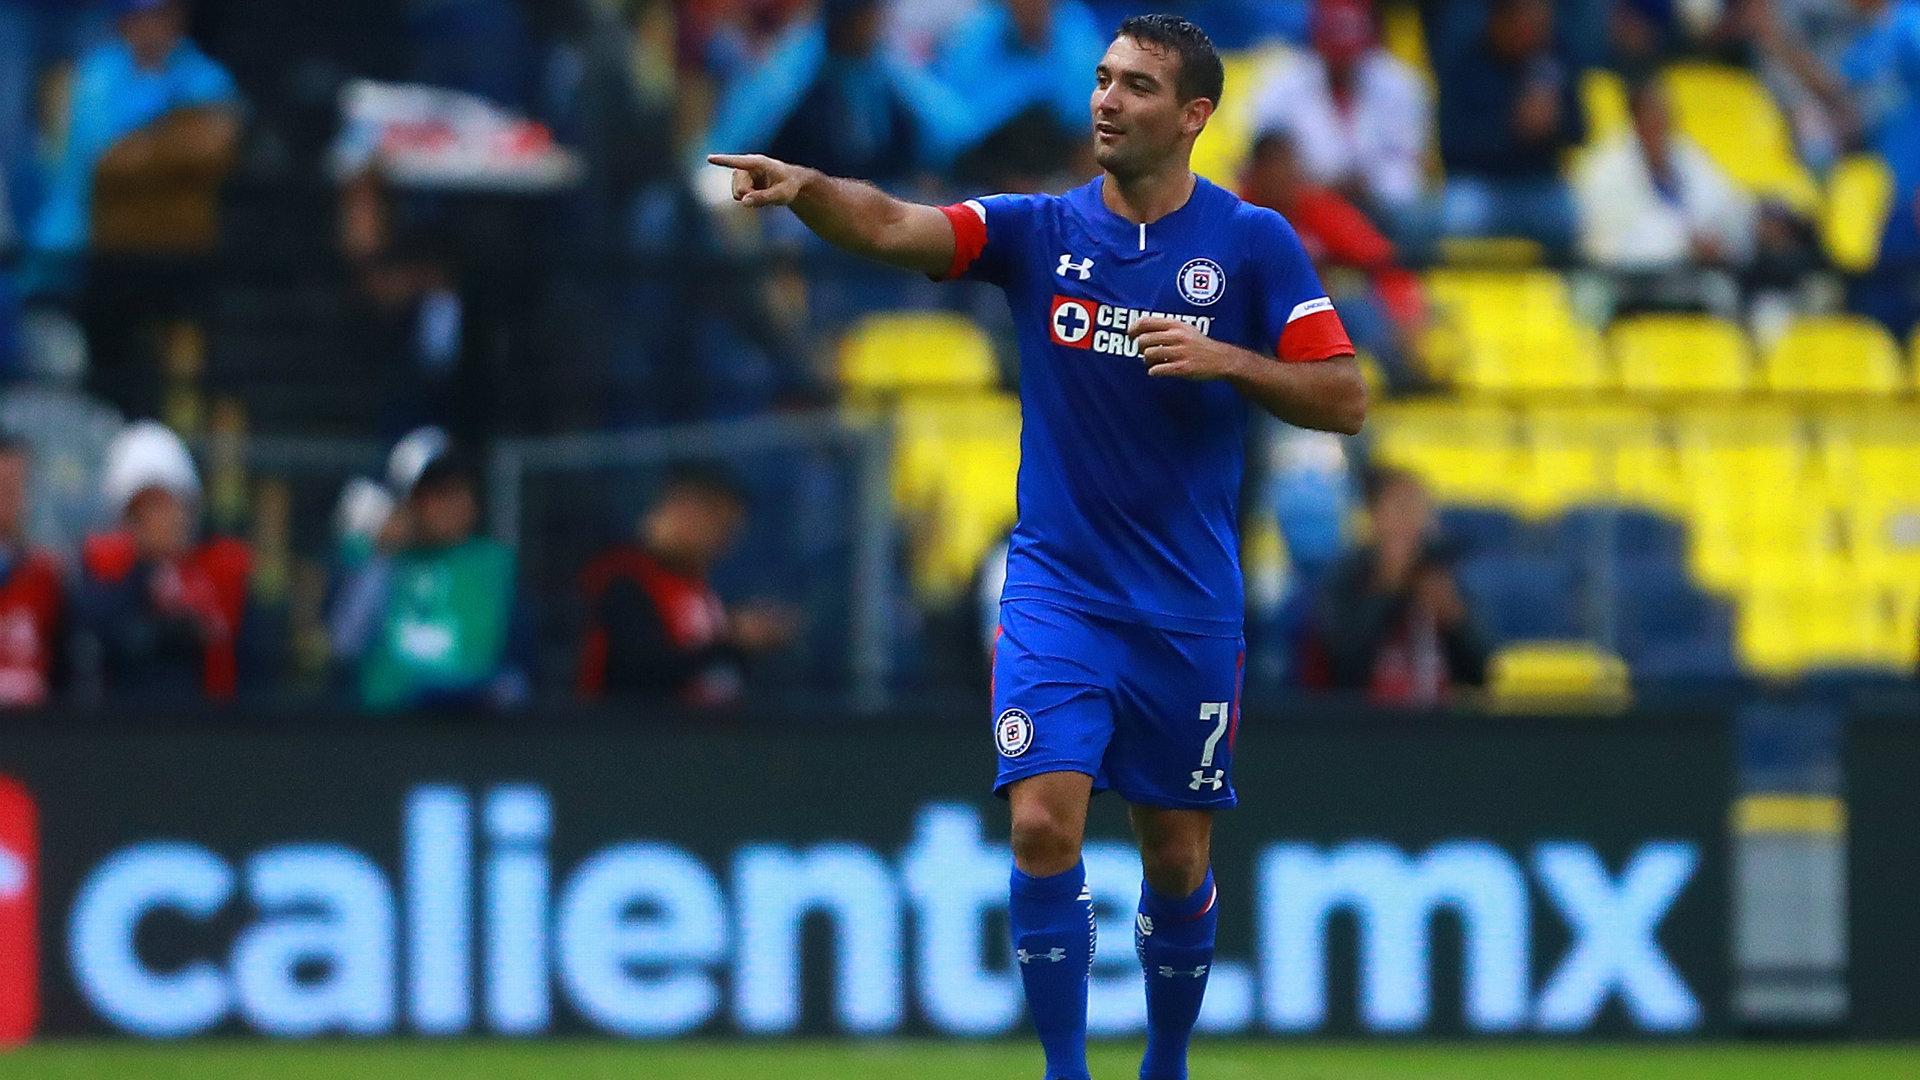 Martín Cauteruccio Liga MX Cruz Azul Apertura 2018